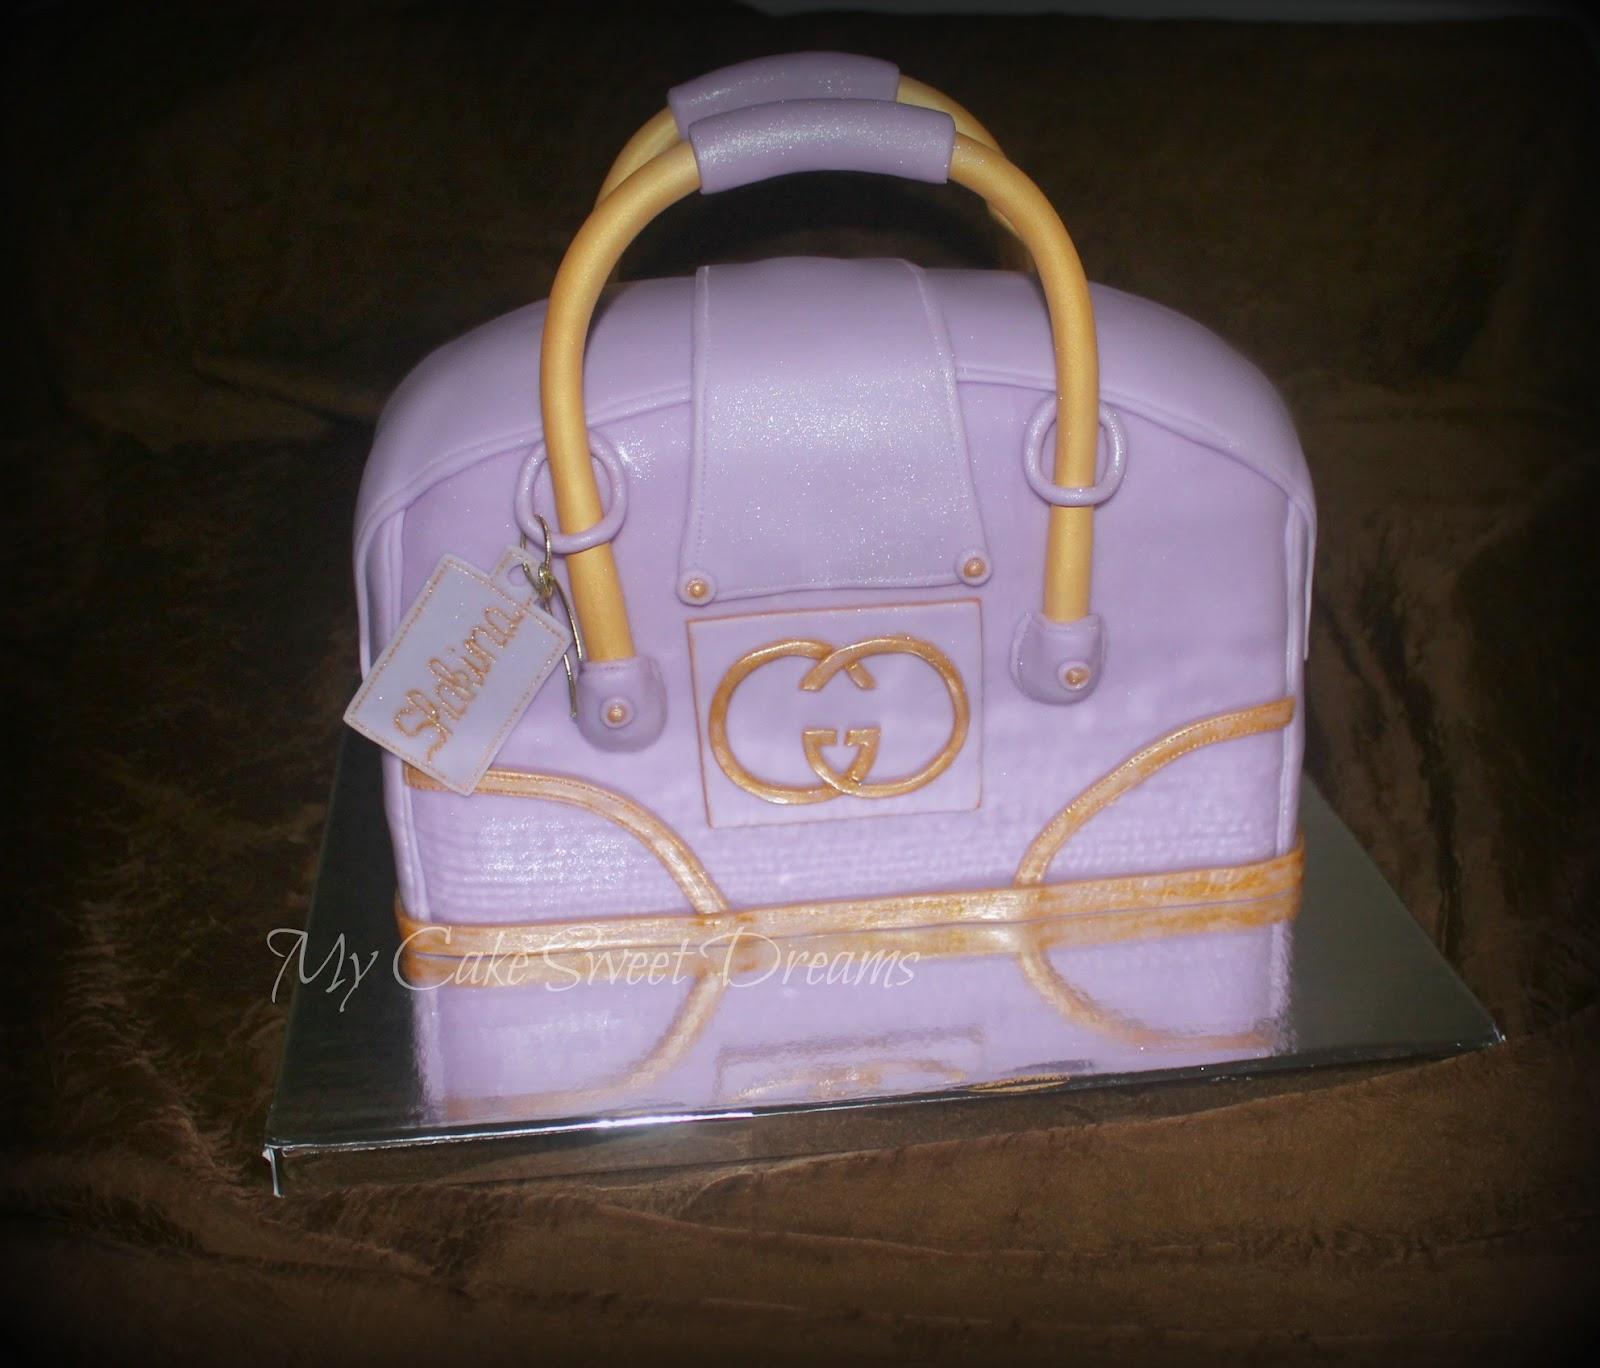 Mycakesweetdreams Gucci Purse Cake